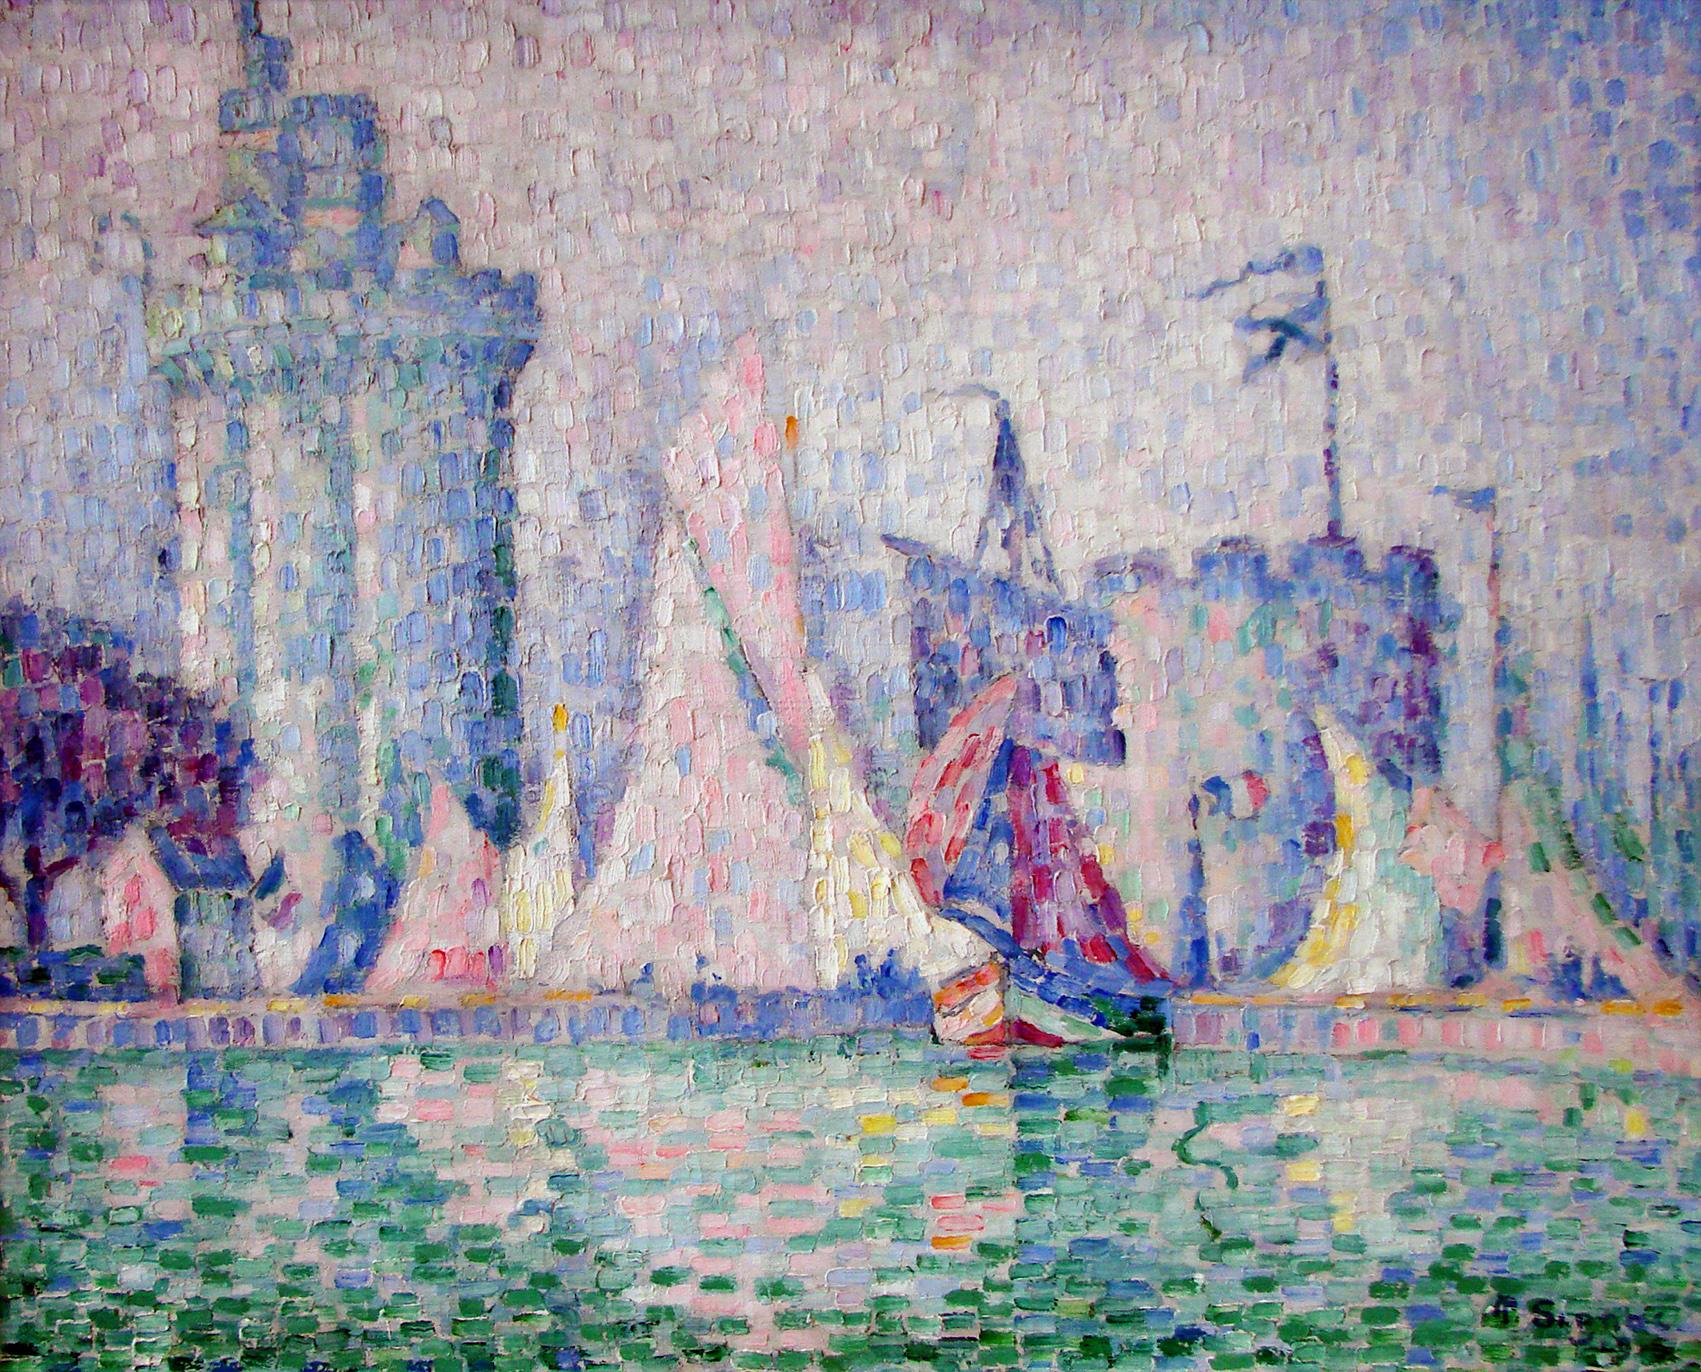 Le Port de La Rochelle, Paul Signac. 1915, oil on canvas. Image: Wikimedia Commons